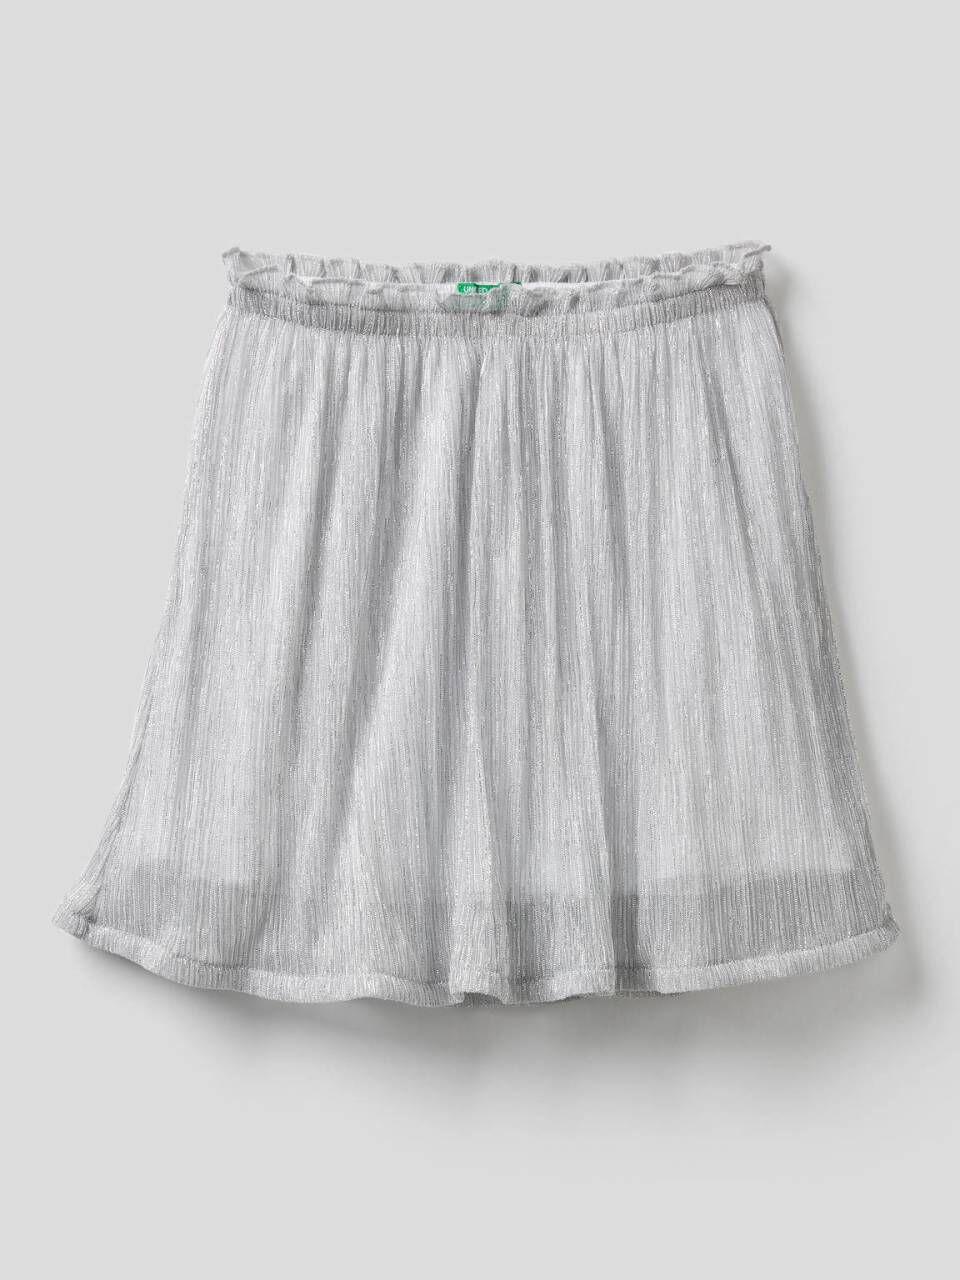 Flared skirt with lurex threads